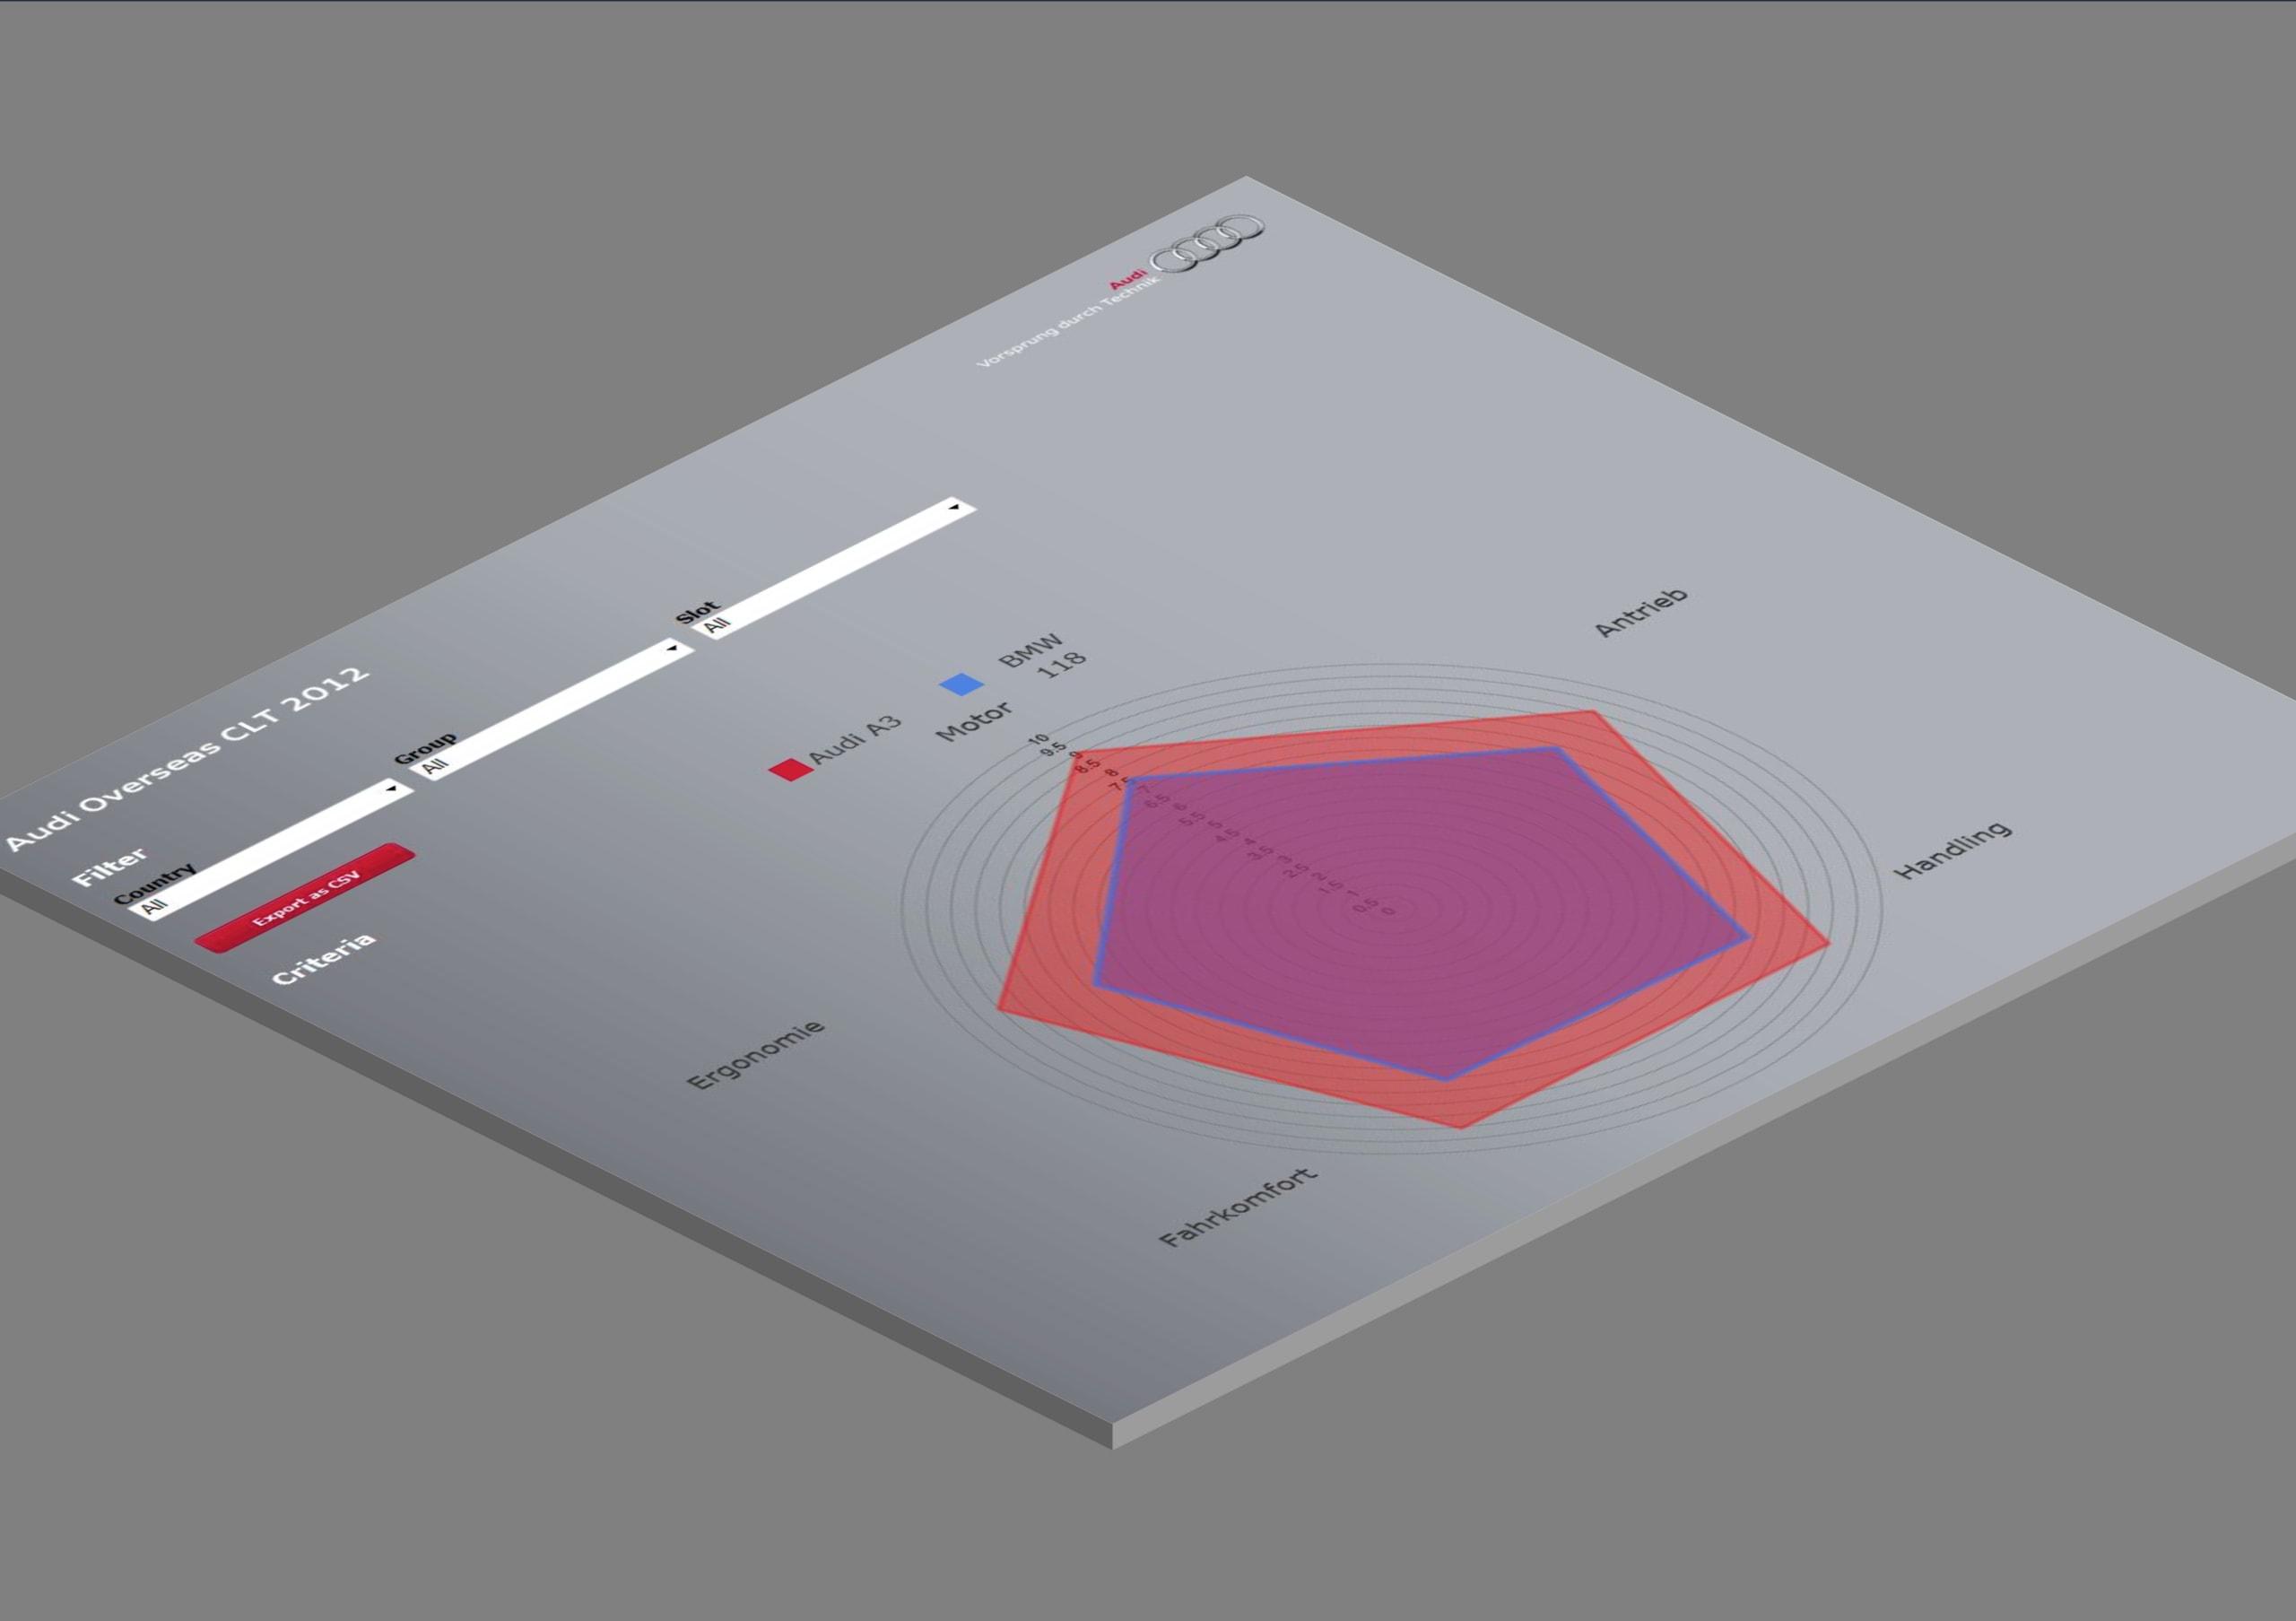 Audi-A3-Compare-CMS-003@3x